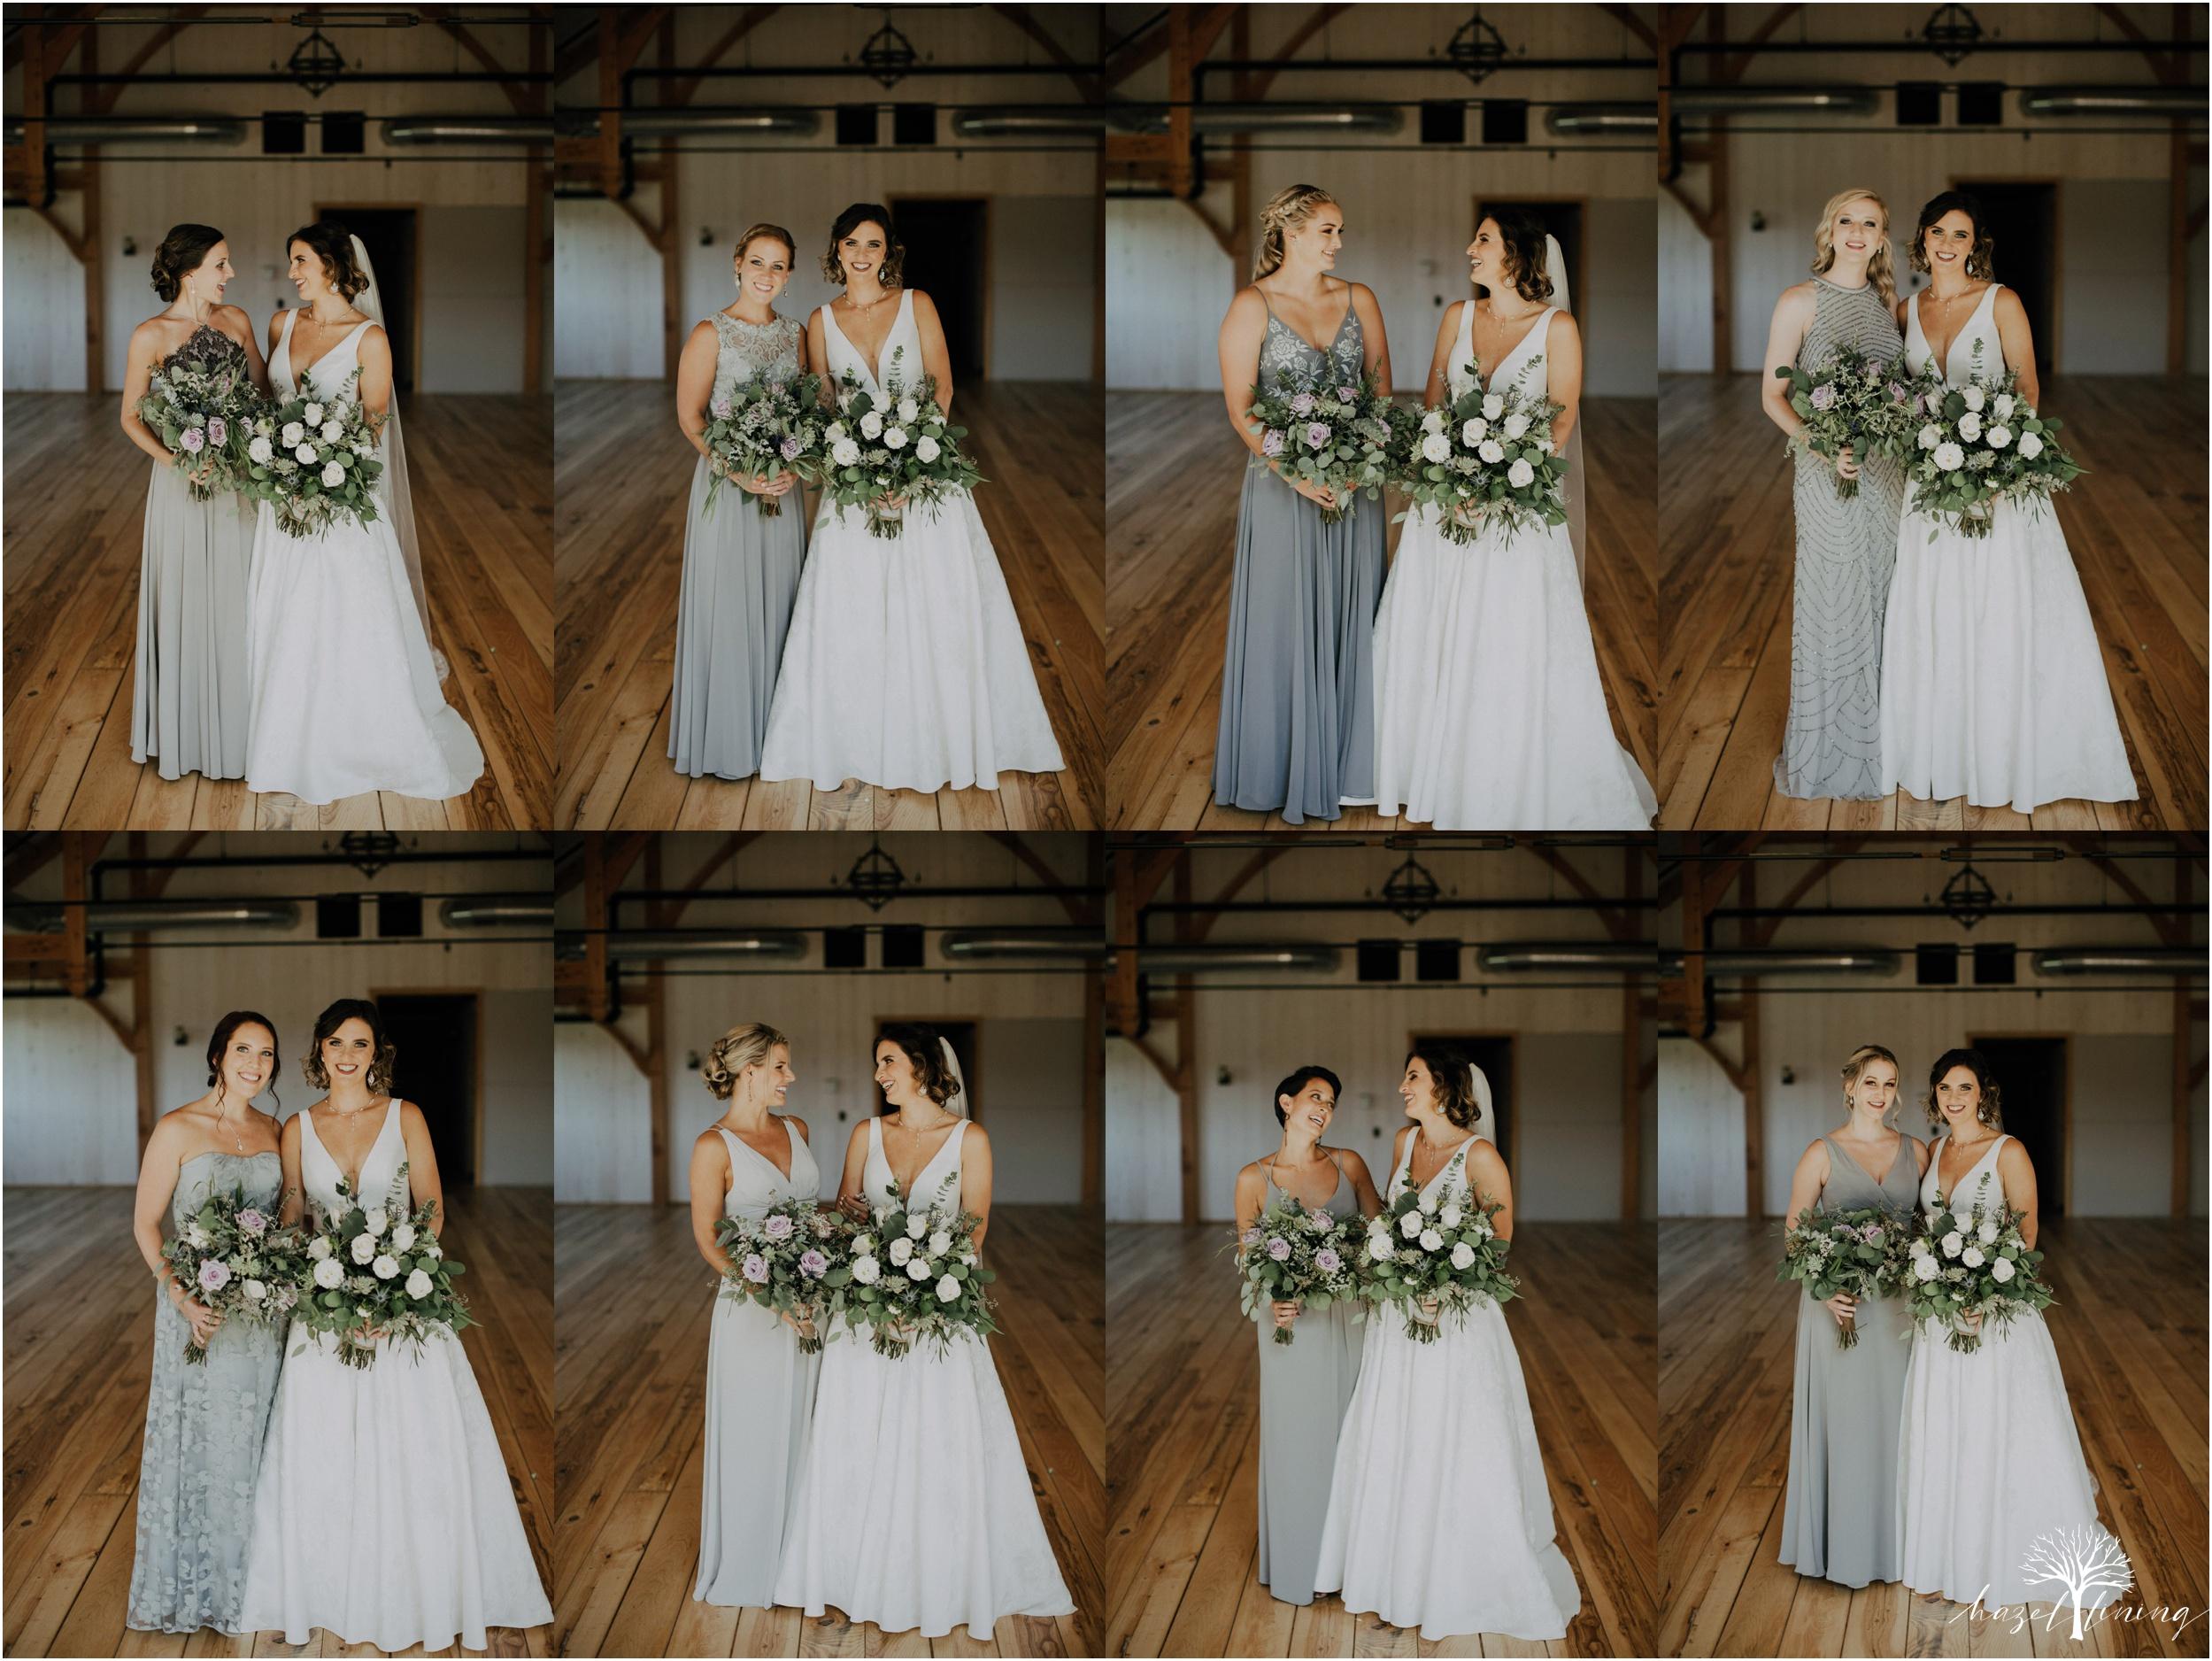 maureen-hepner-anthony-giordano-rose-bank-winery-newtow-pennsylvania-luxury-summer-wedding-hazel-lining-photography-destination-elopement-wedding-engagement-photography_0035.jpg